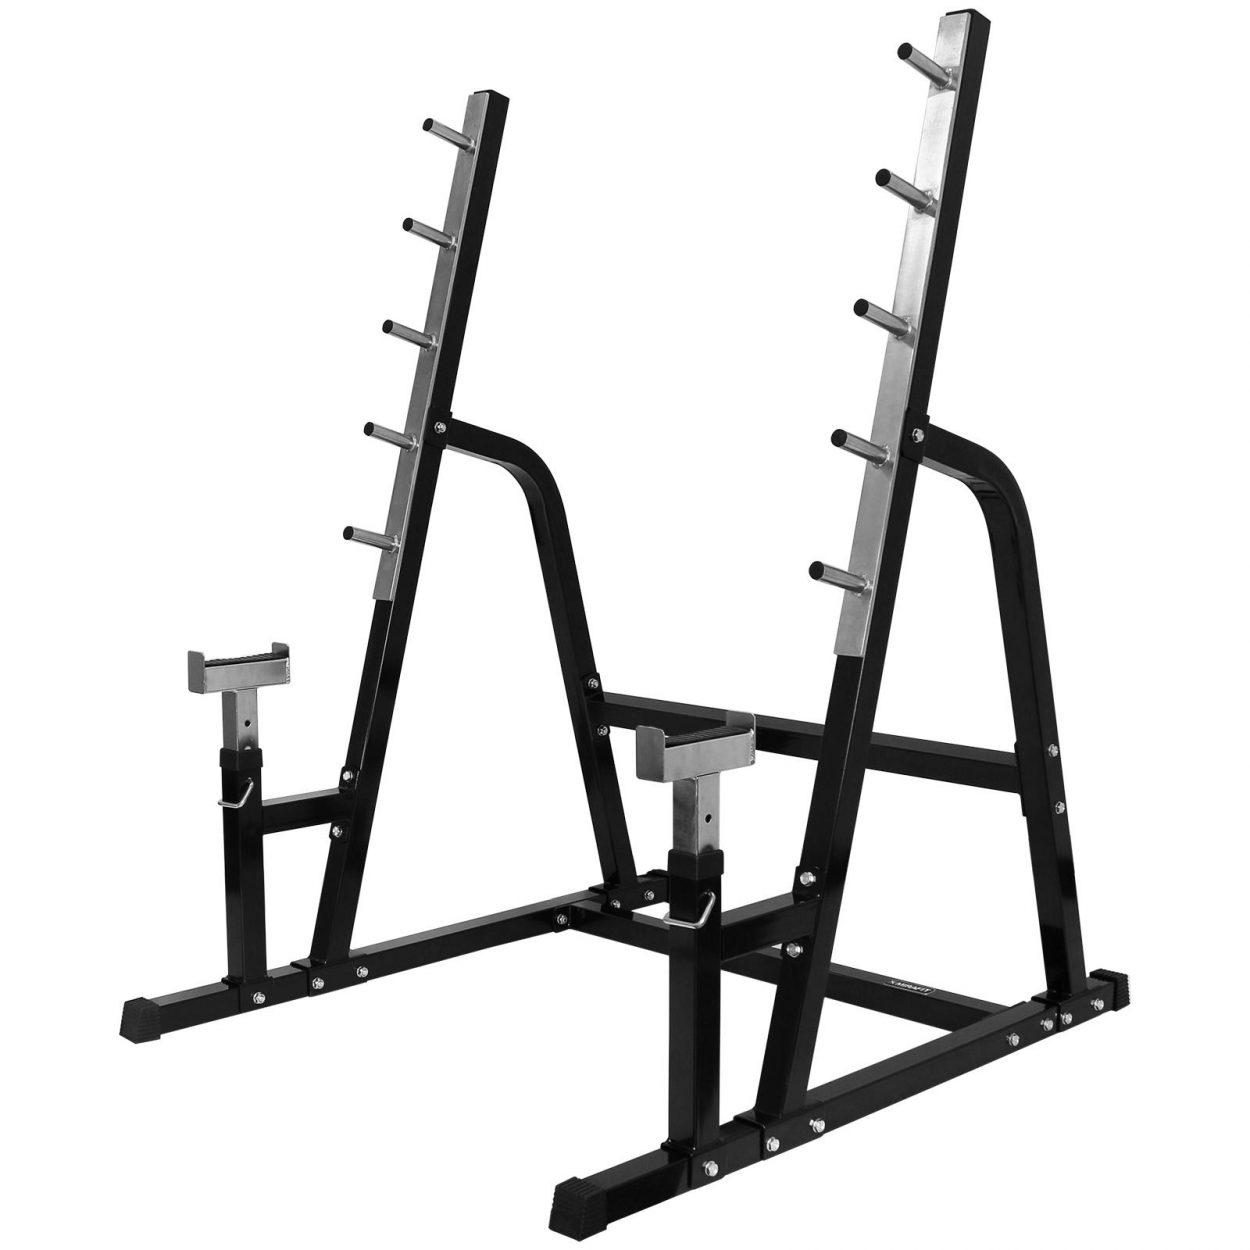 Mirafit M1 Multi Use Weight Lifting Rack – Black/Stainless Steel